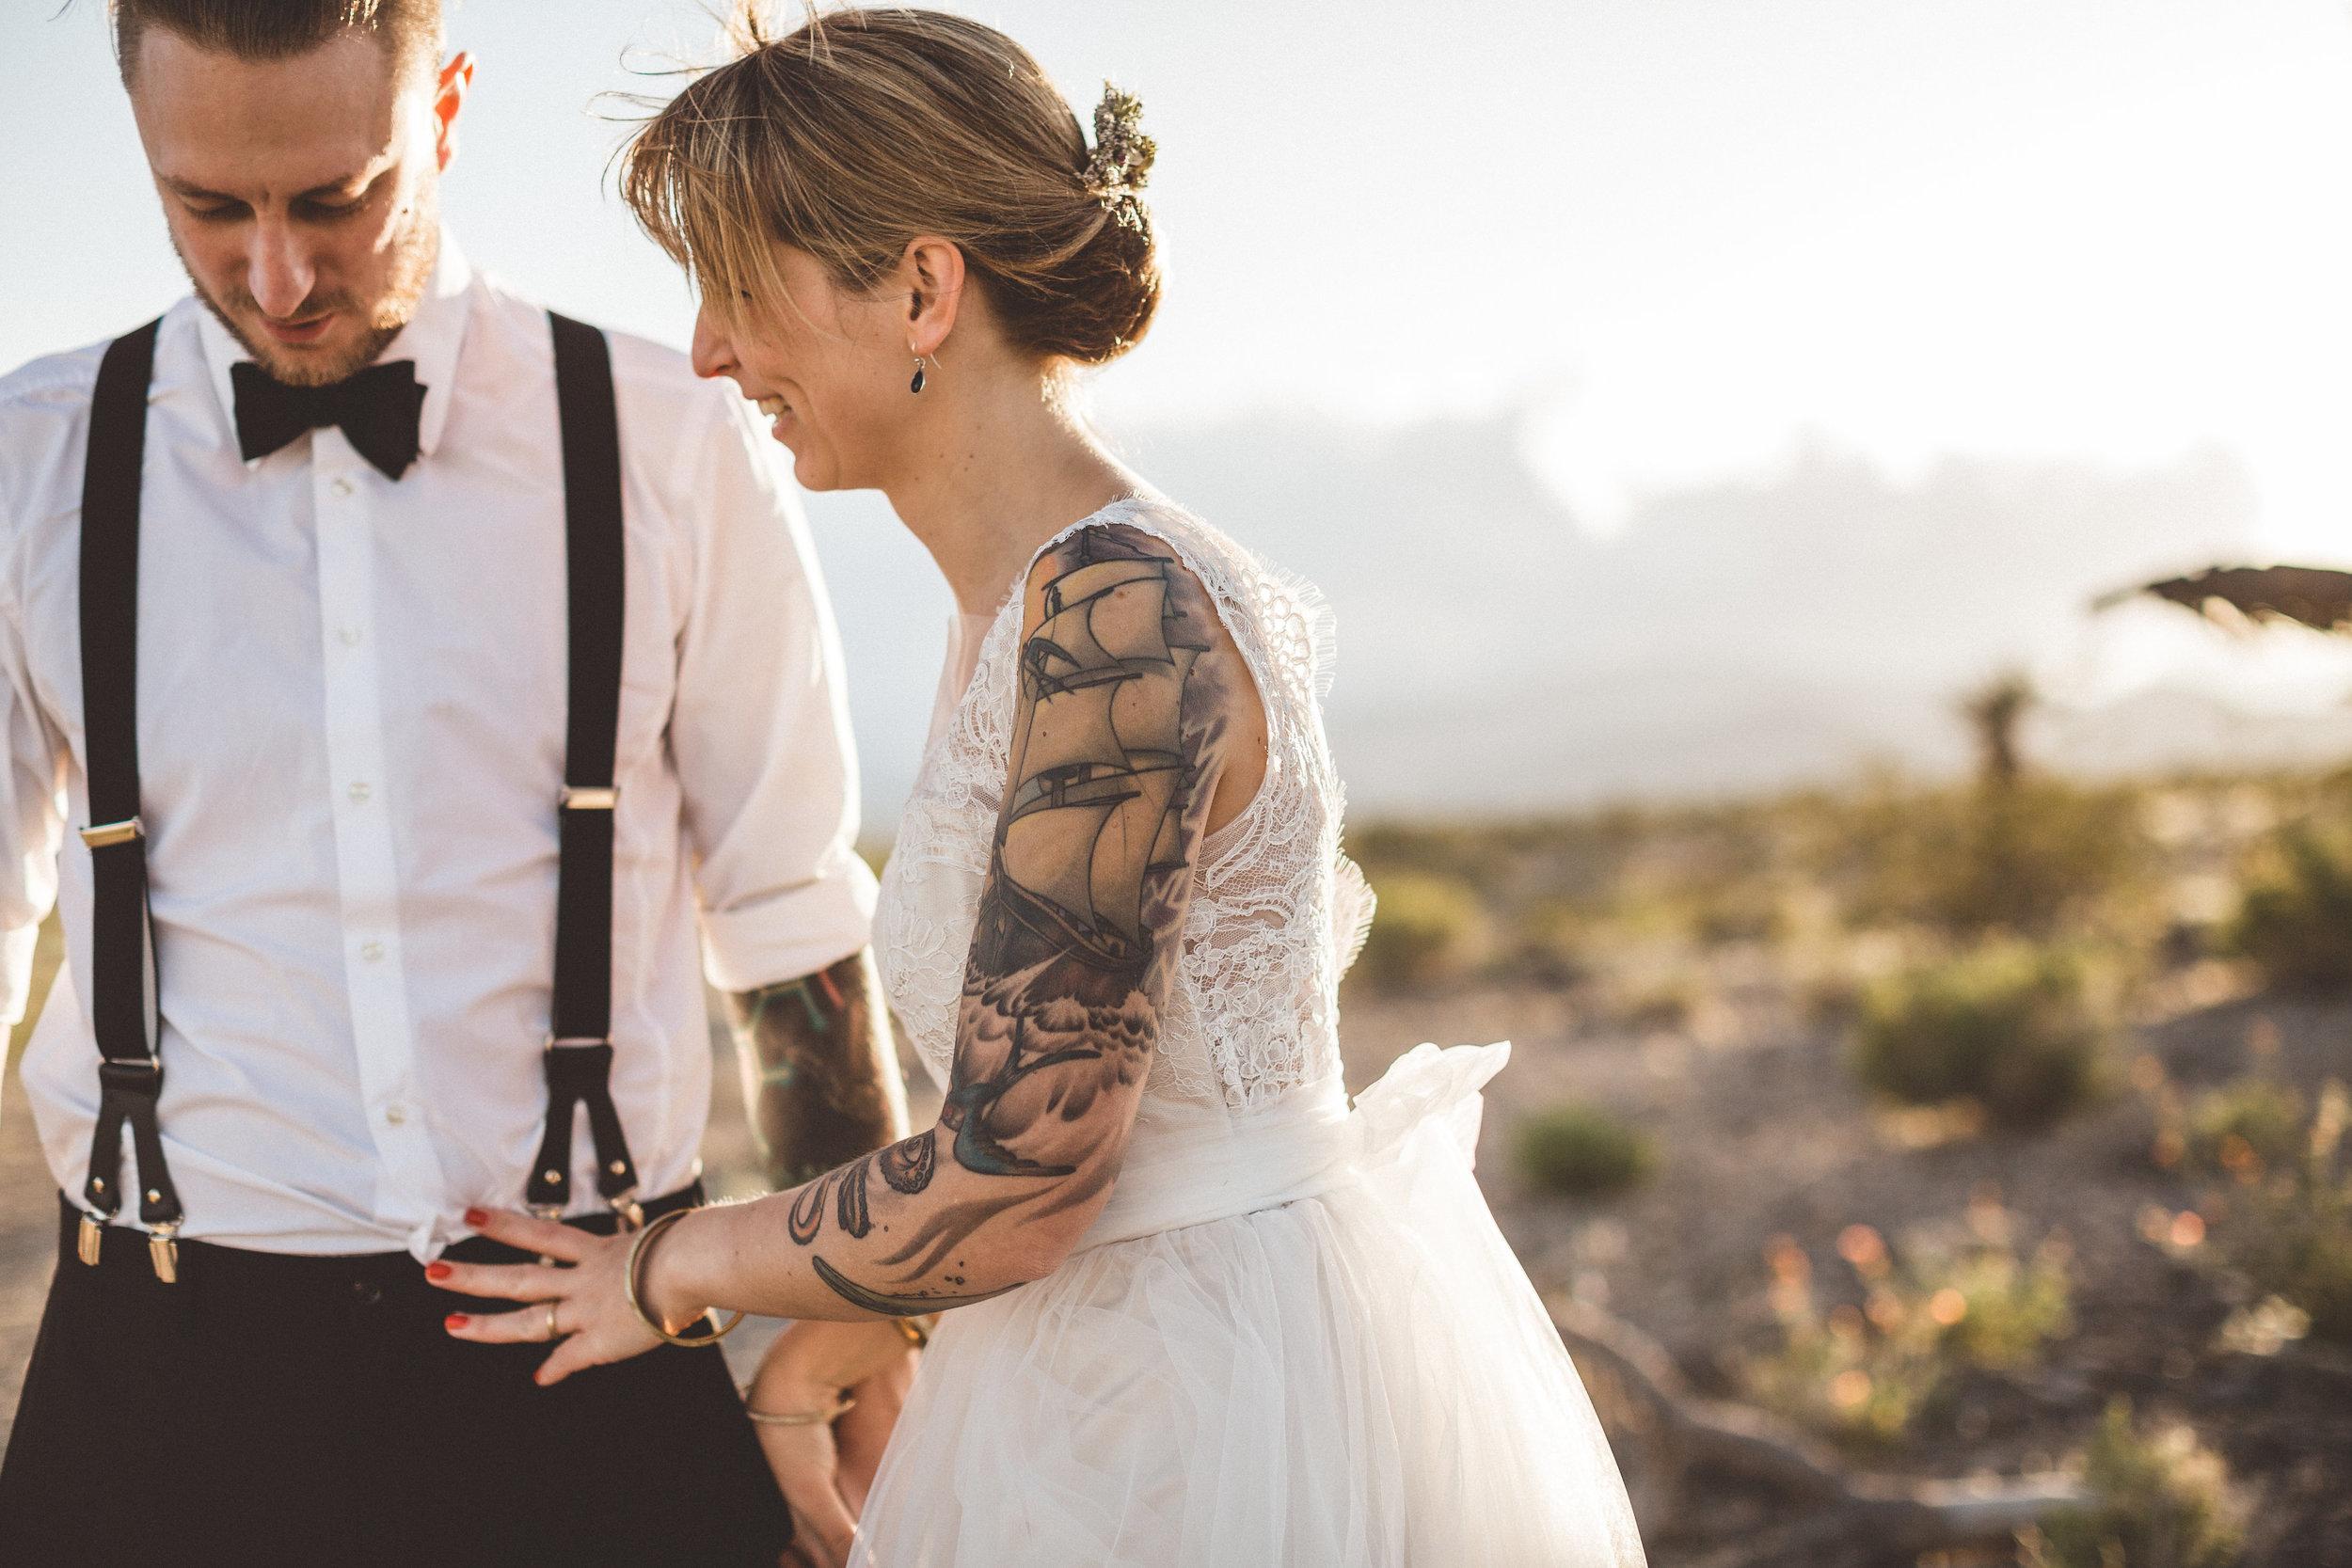 meike-and-rene-las-vegas-desert-elopement32.jpg